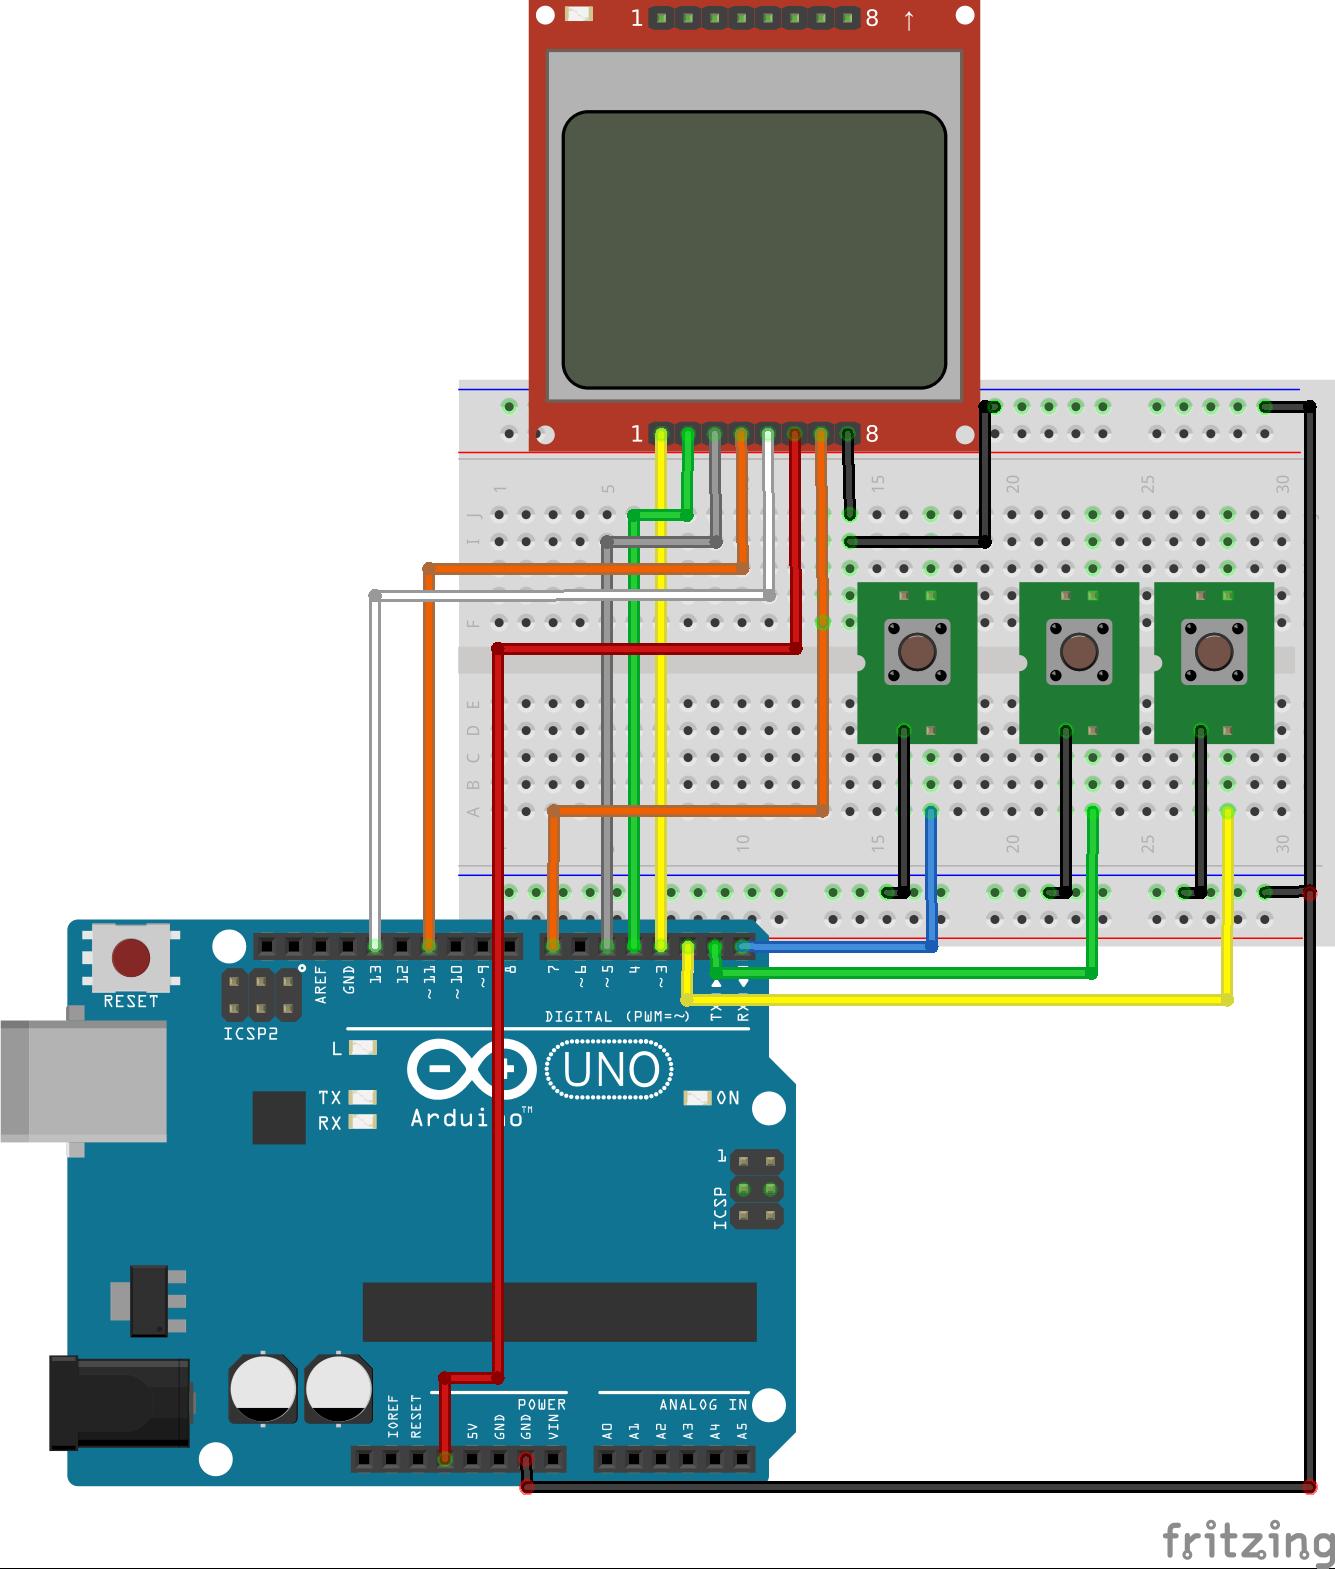 Arduino Nokia 5110 Menu - educ8s tv - Watch Learn Build